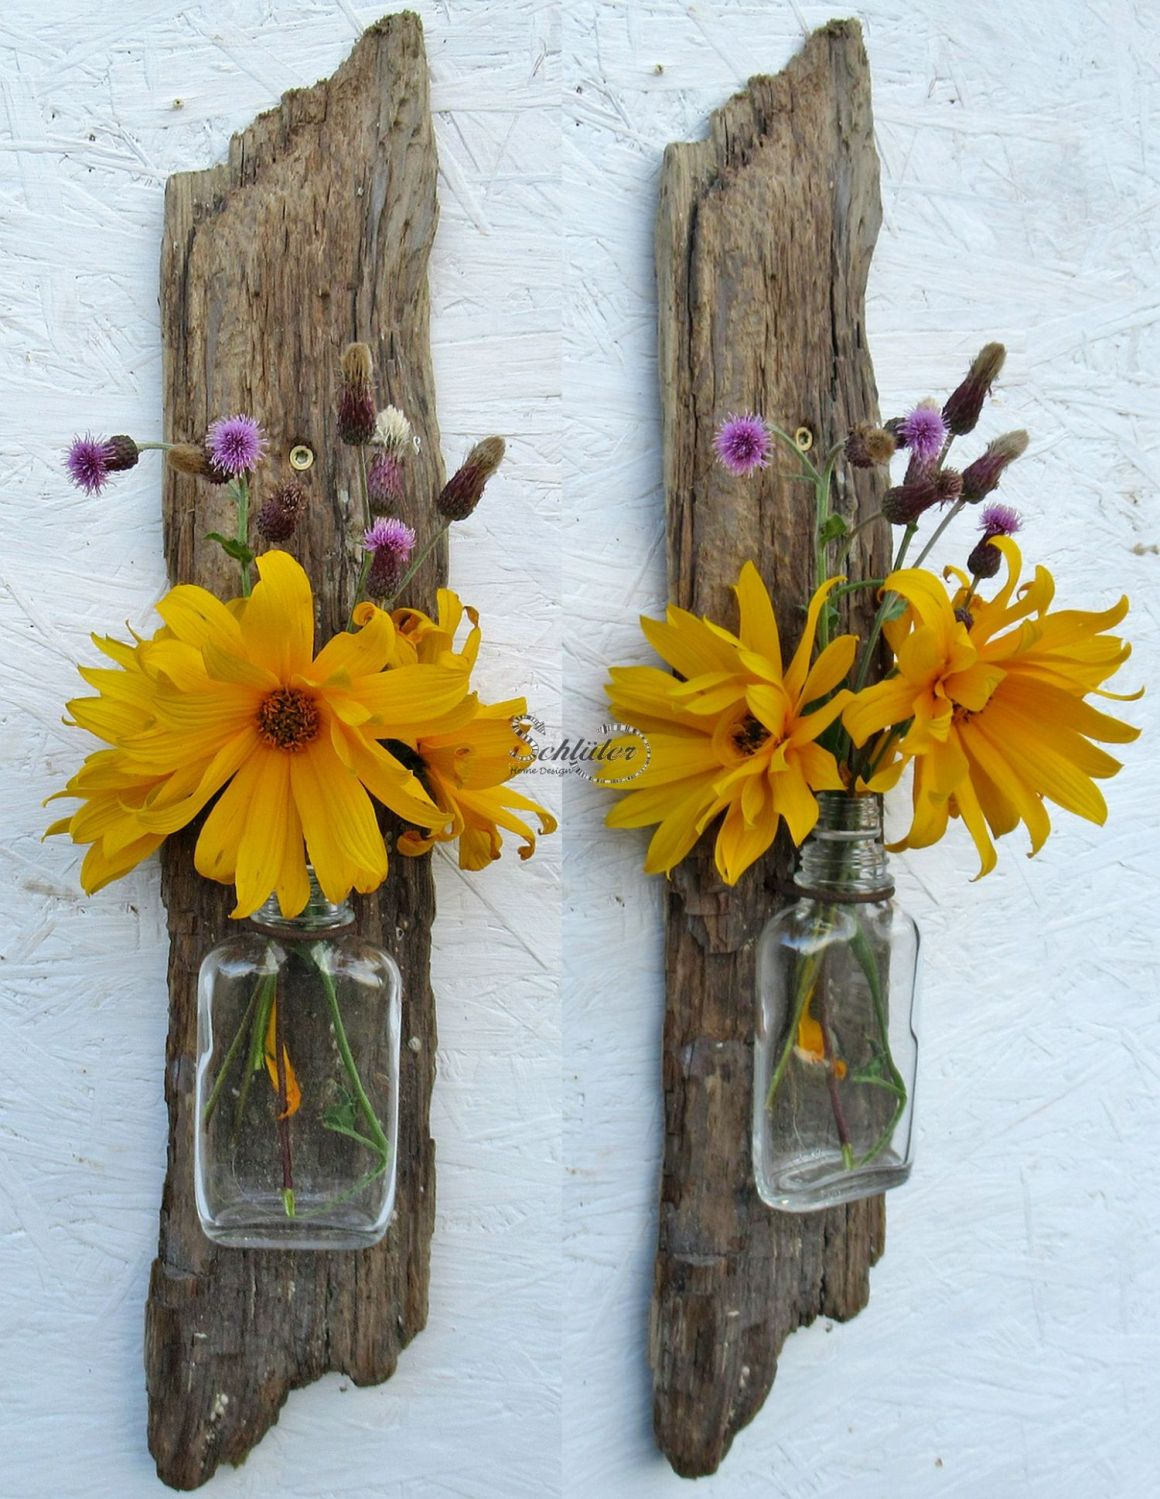 Upcycling idee Vase aus Treibholz und Glas